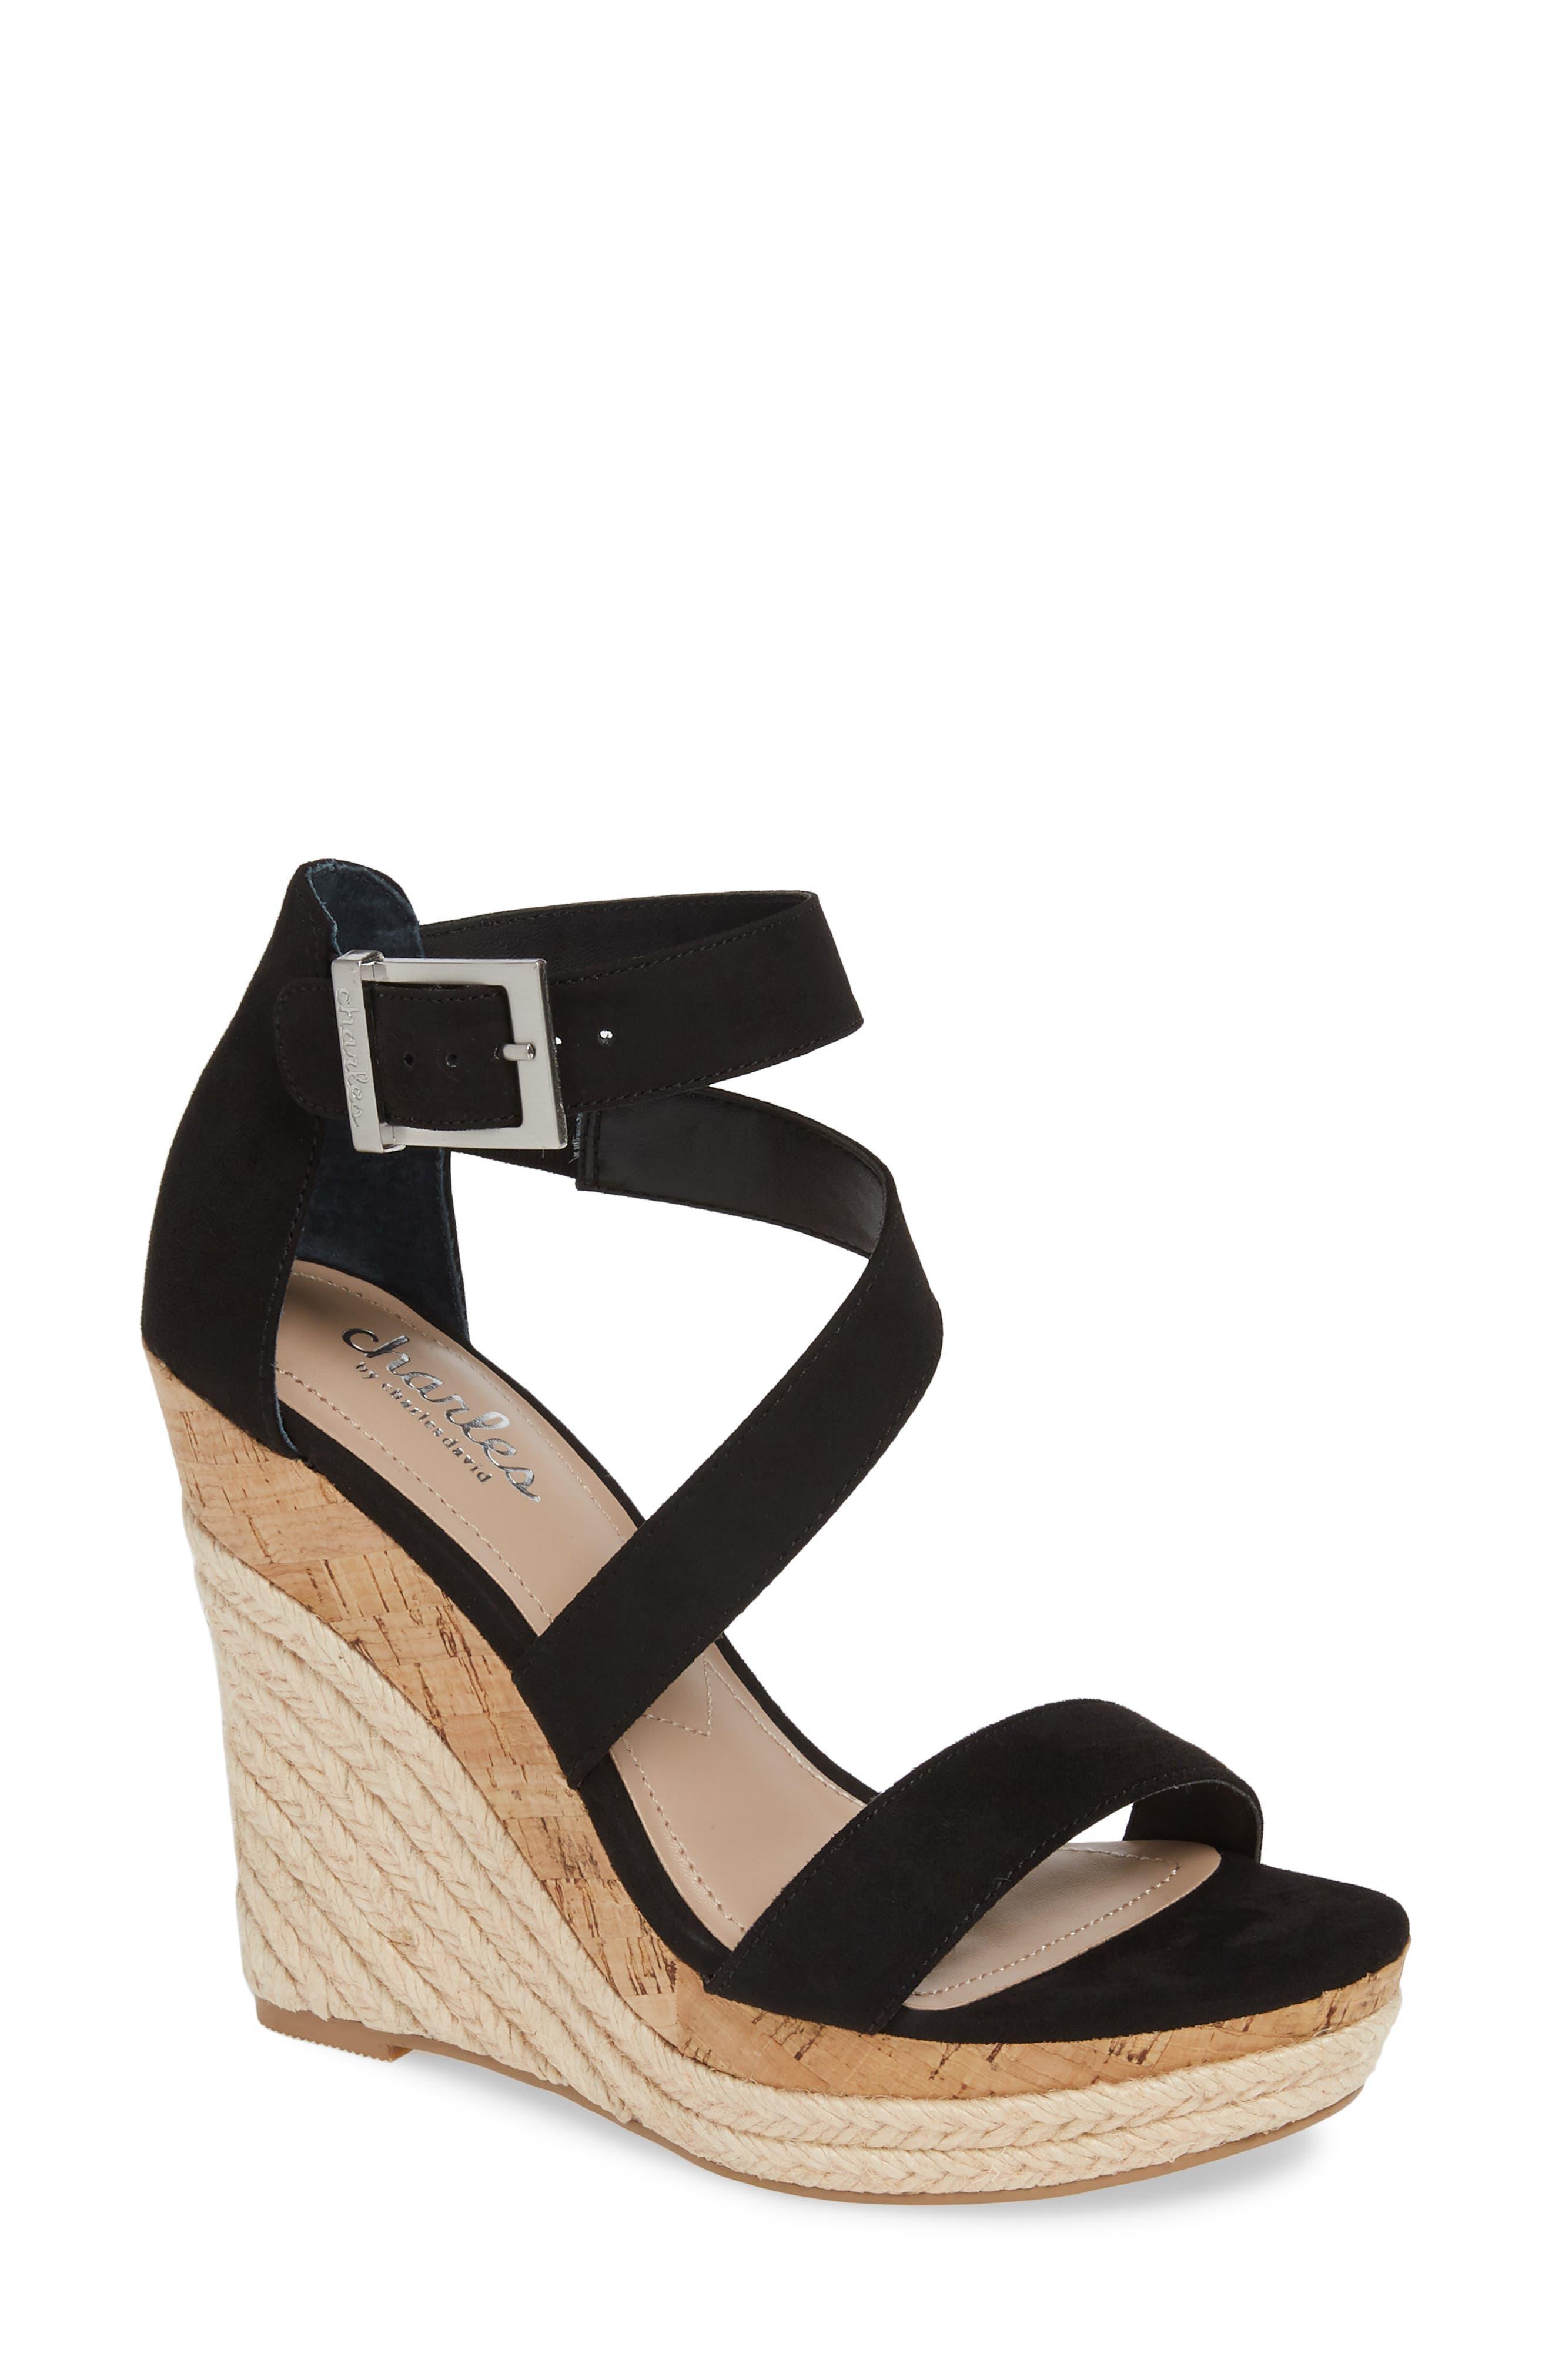 Charles By Charles David Adrielle Asymmetrical Platform Wedge Sandal, Black